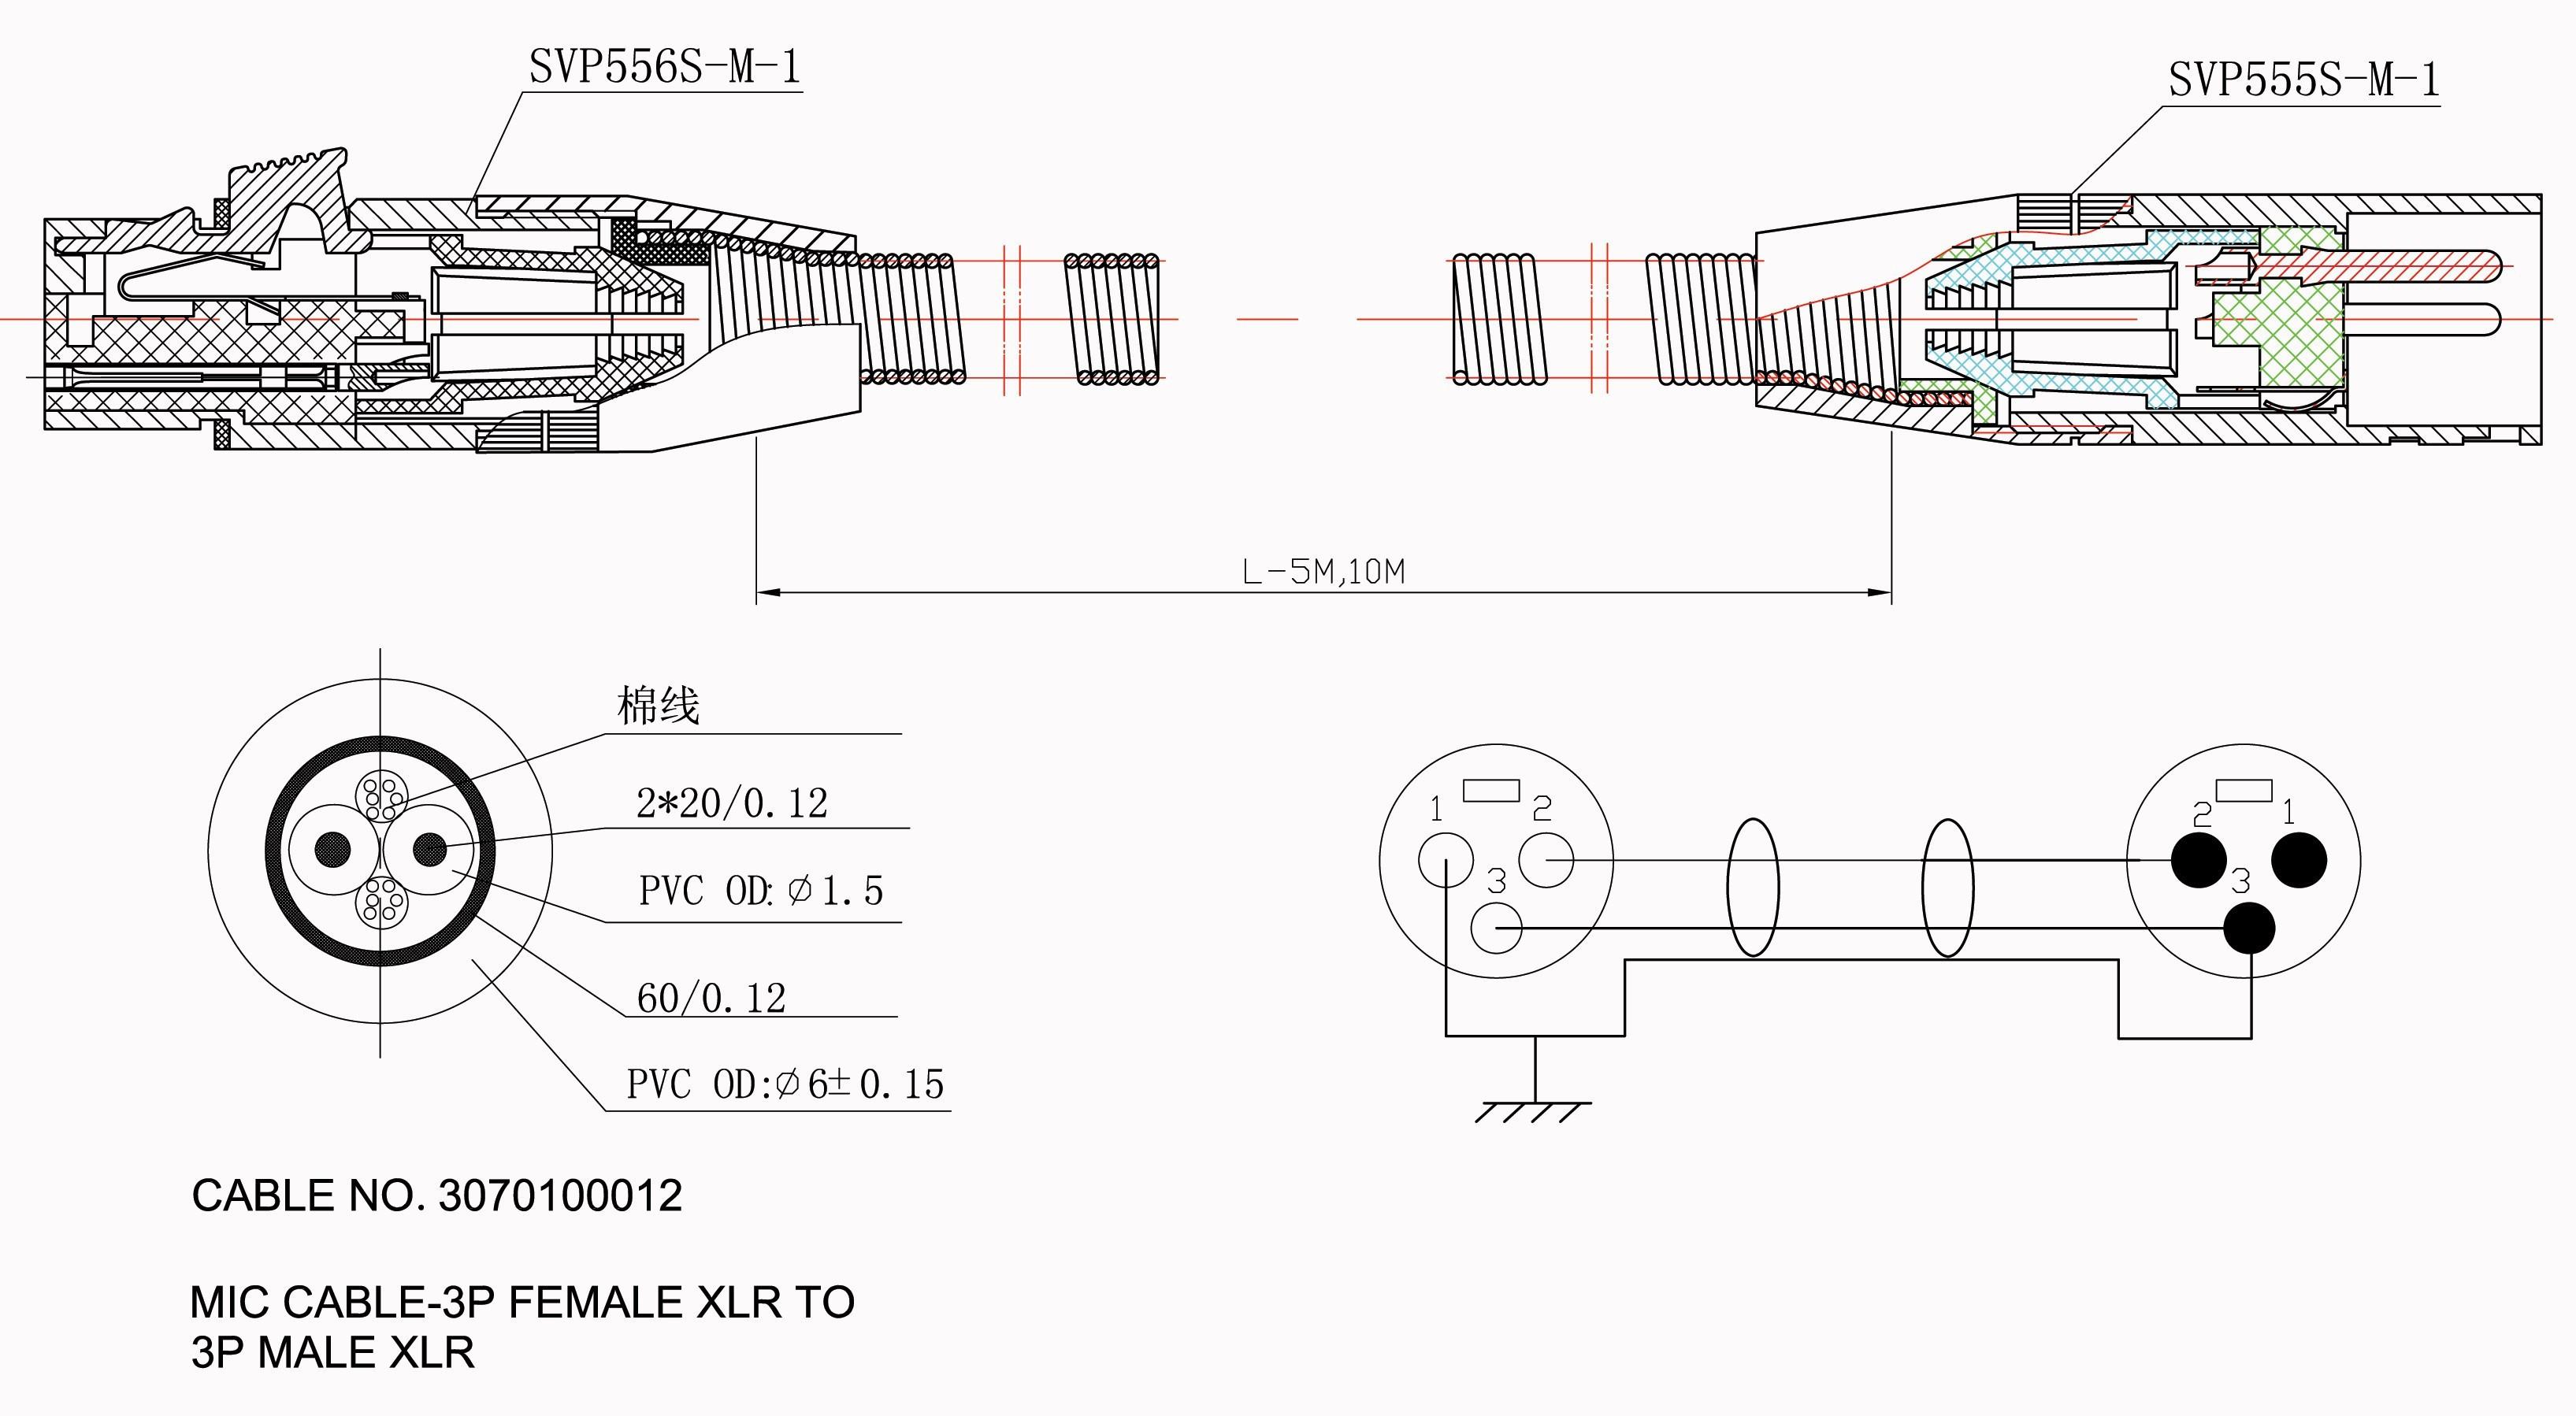 Kenmore Washer Wiring Diagram Kenmore Electric Dryer Wiring Diagram 2018 Wiring Diagram Appliance Of Kenmore Washer Wiring Diagram